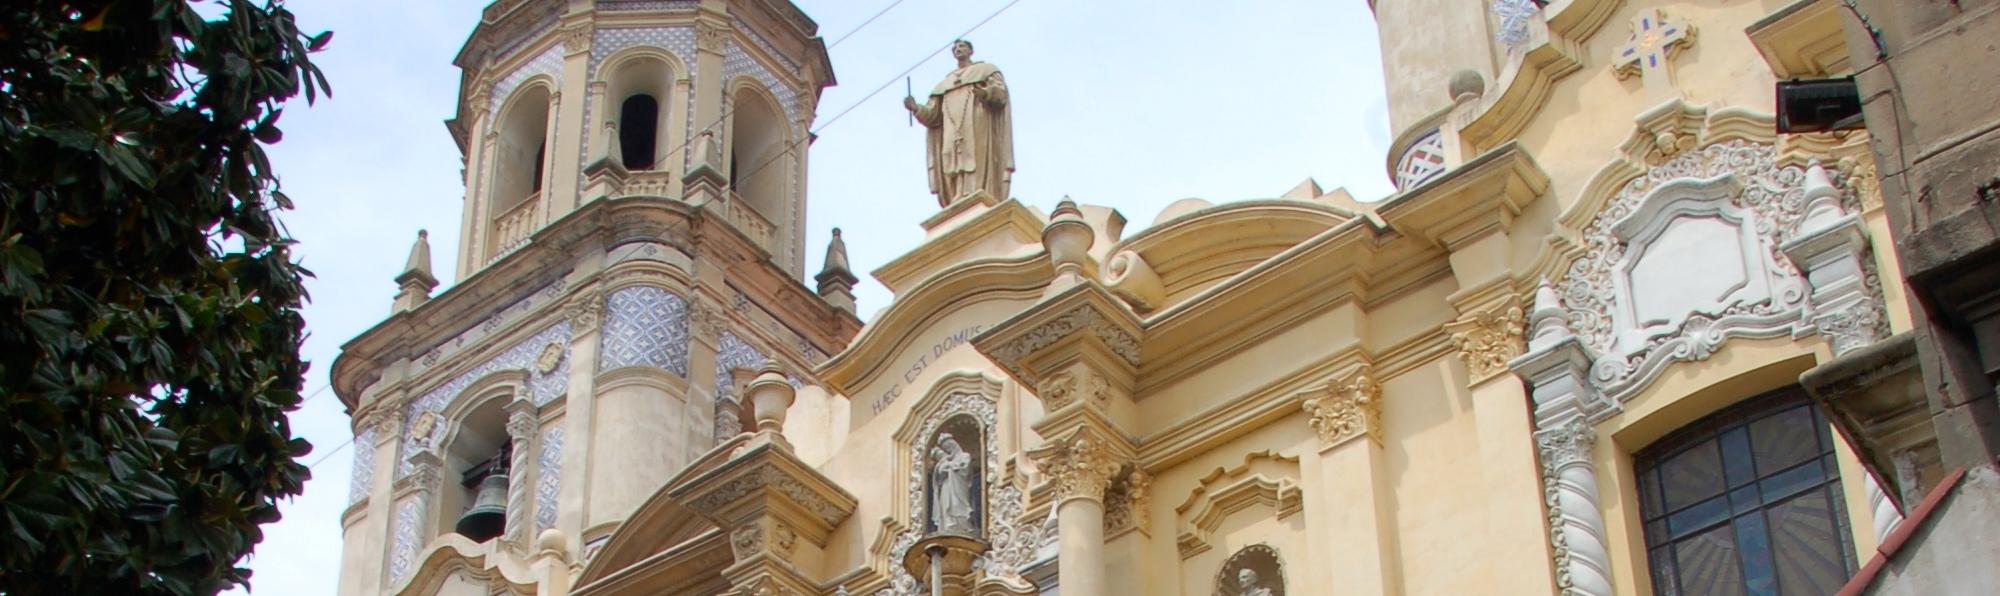 Iglesia de San Ignacio, buenos Aires